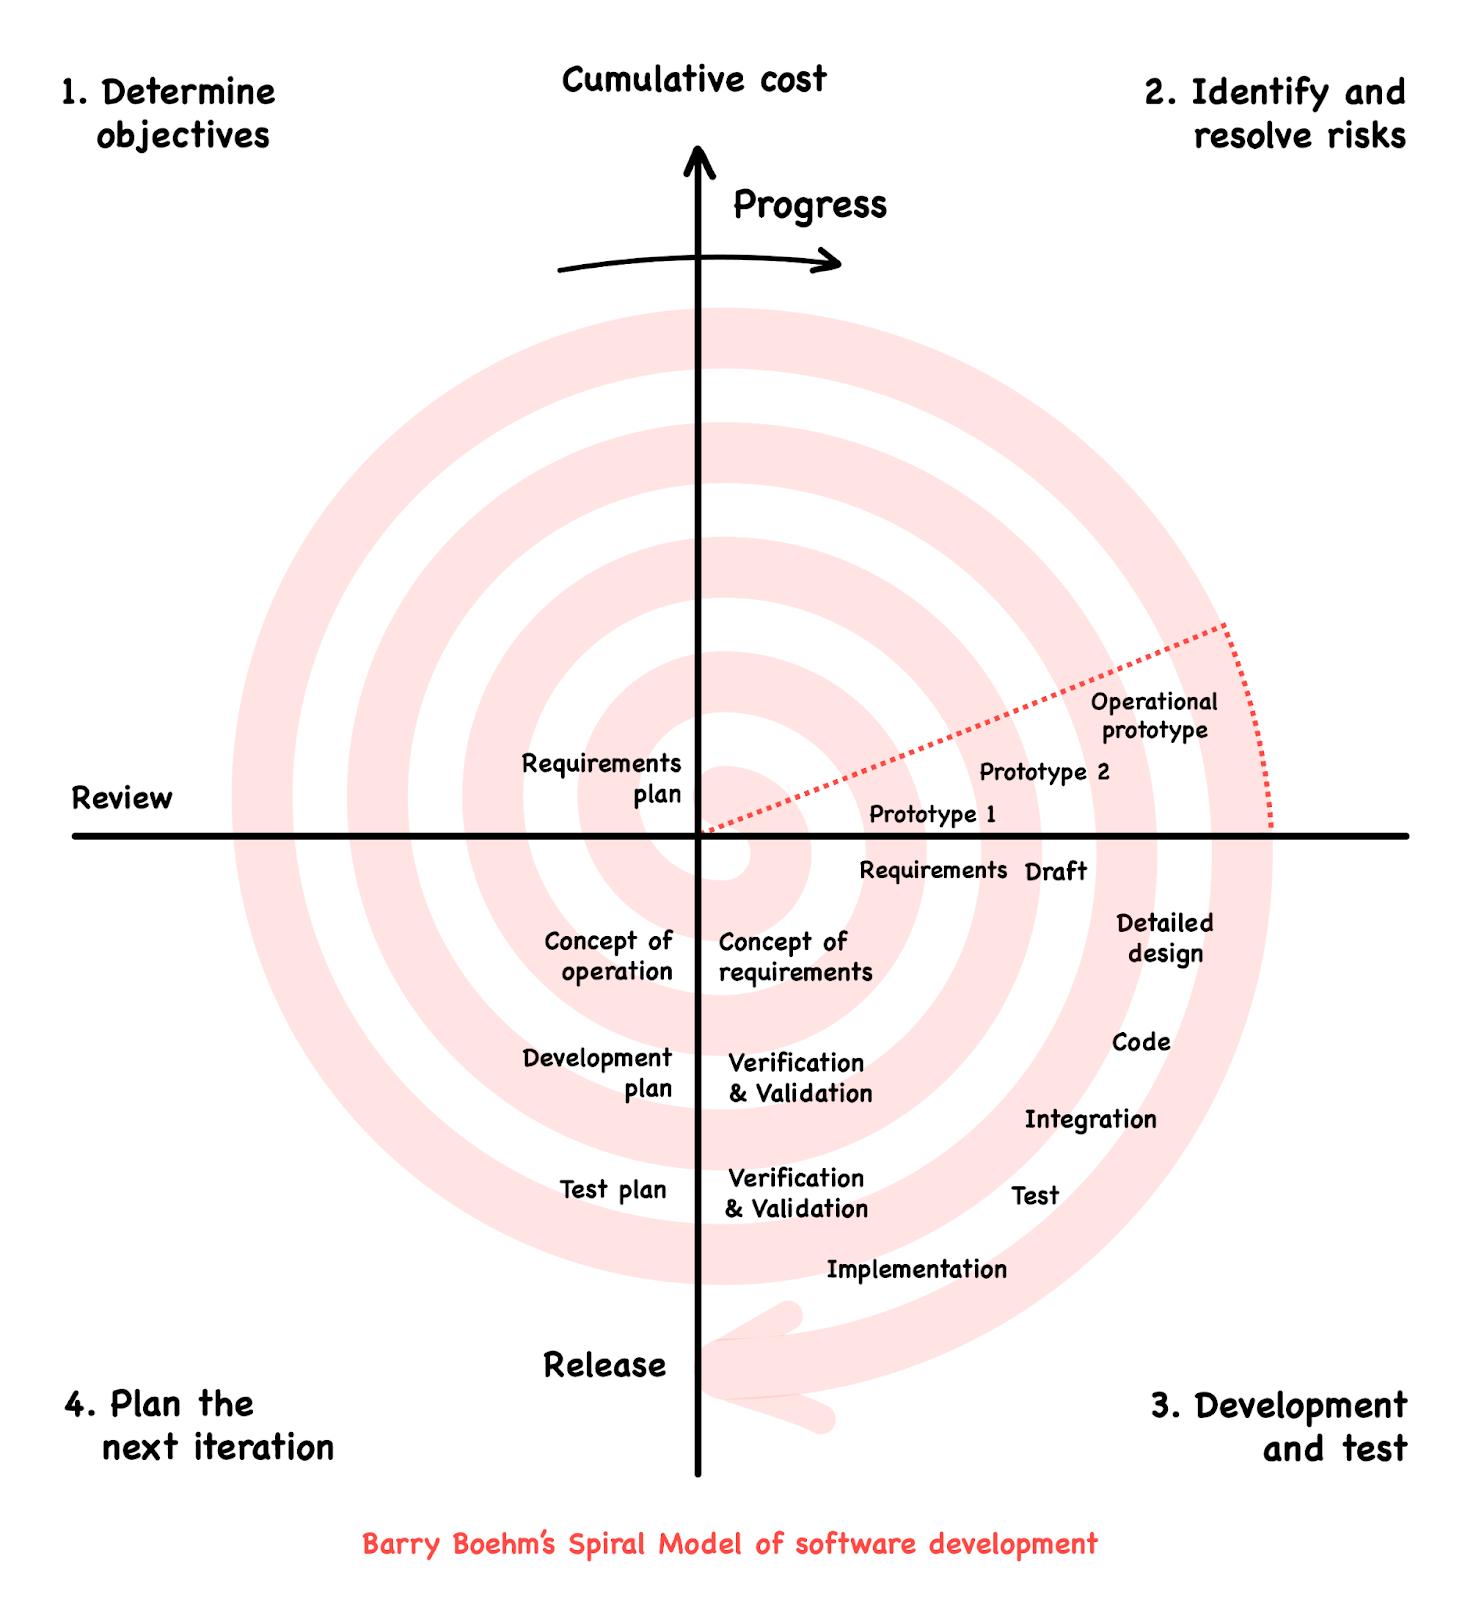 Barry Boehm's Spiral Model of software development